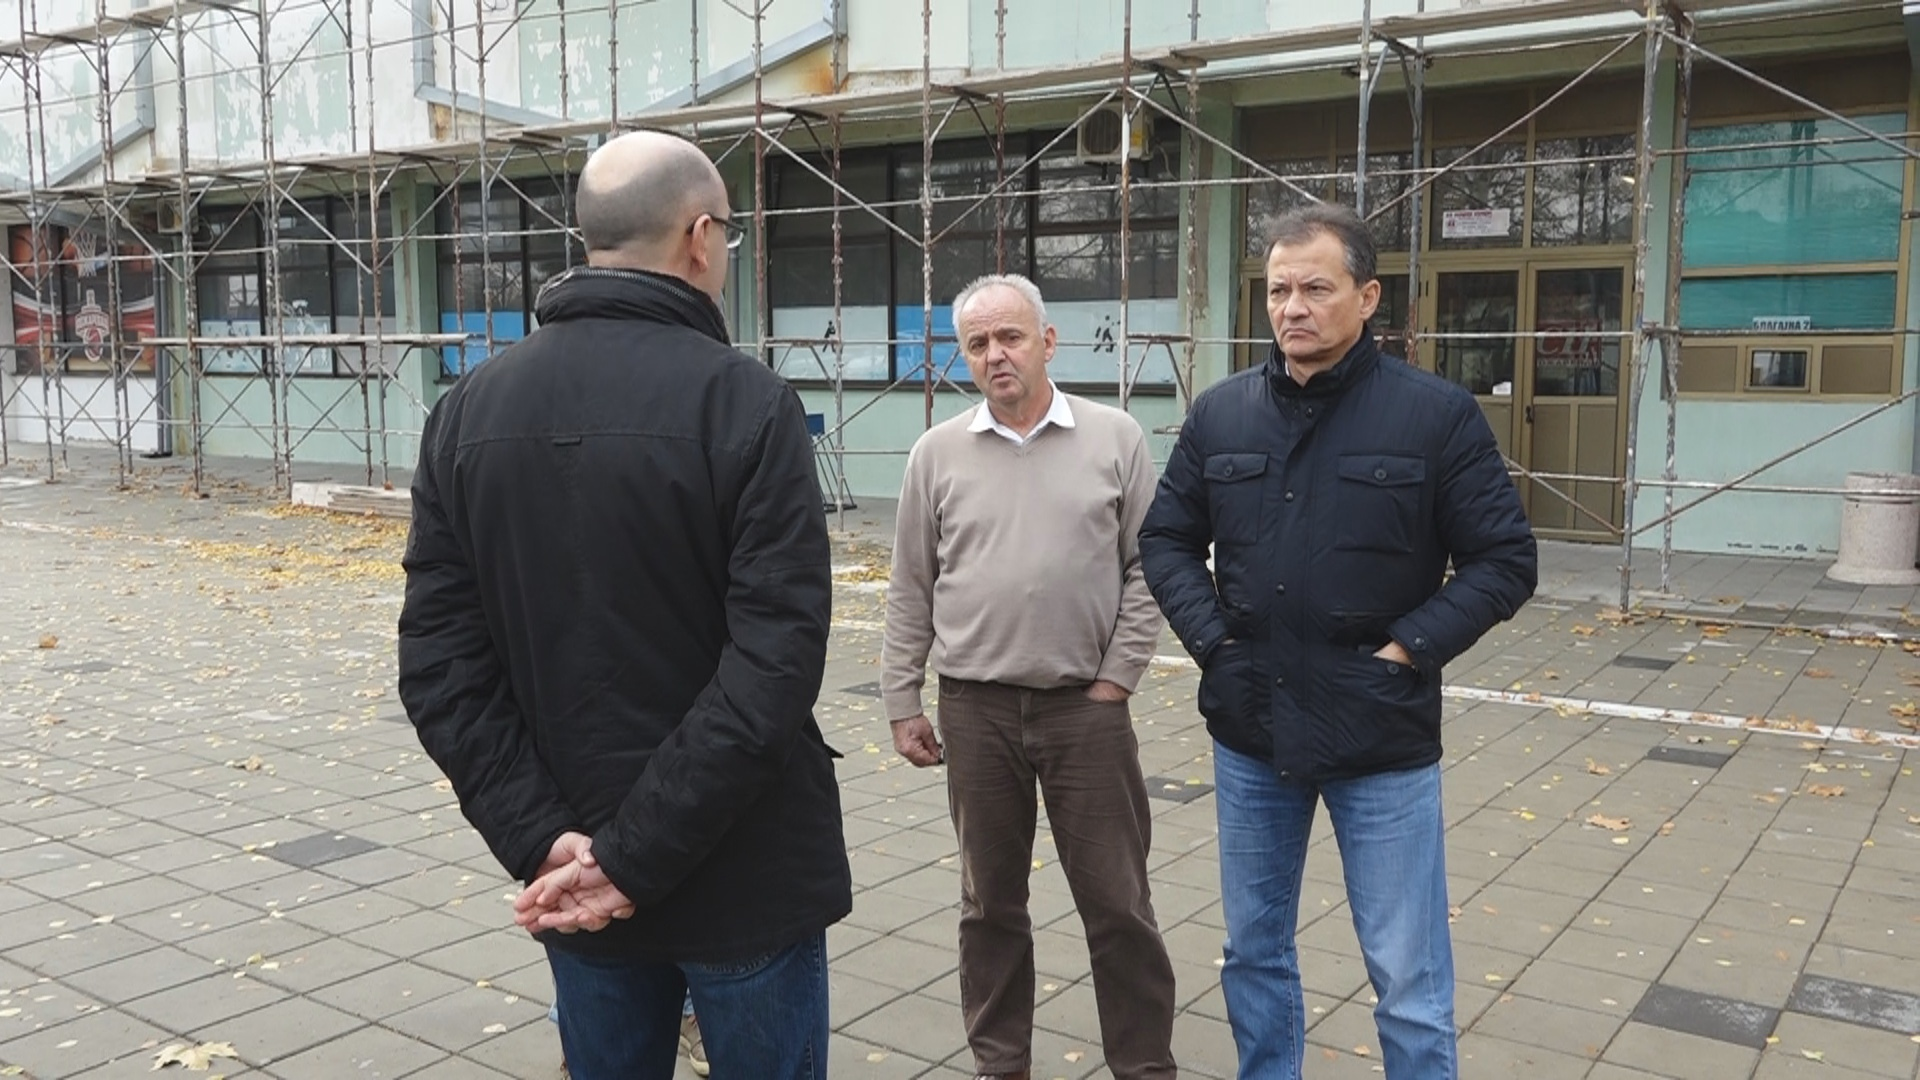 Gradonačelnik Grada Požarevca Bane Spasović obišao radove na Hali sportova 13129